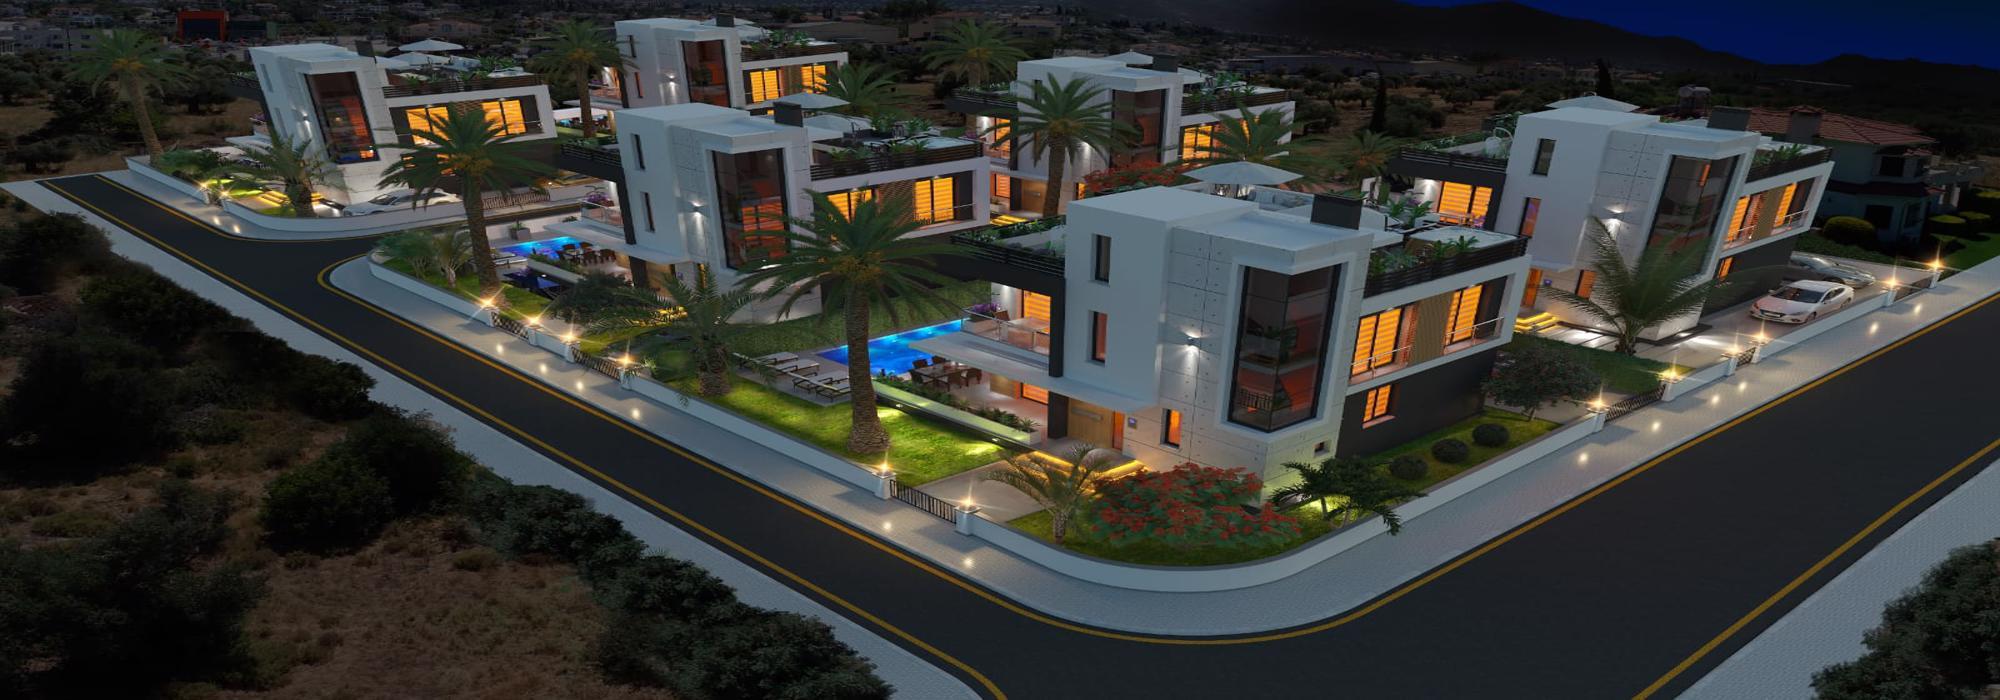 Elegant 4 Bedroom Villa For Sale Location Catalkoy Girne (Turkish Title Deeds)